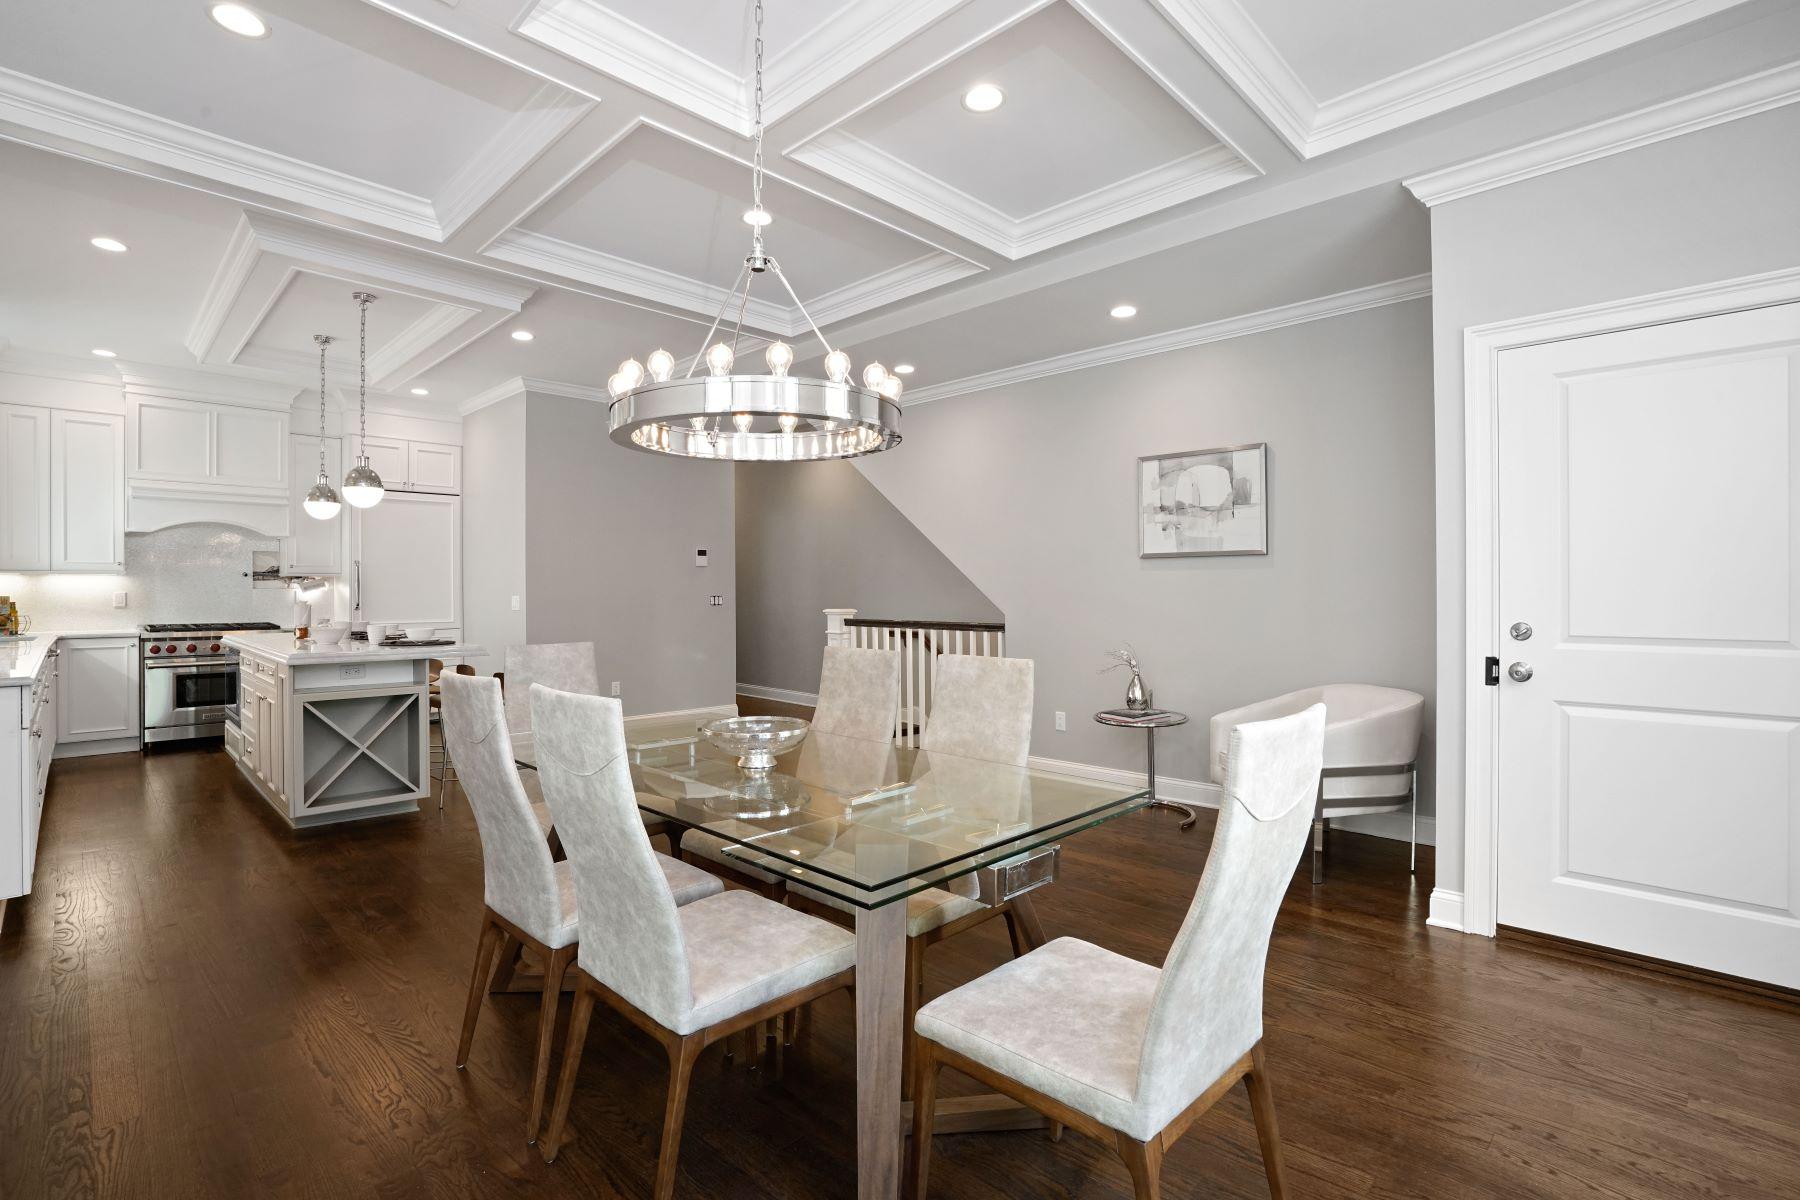 Condominio por un Venta en 66 Otis St, Unit 1 66 Otis Street Unit 1 Cambridge, Massachusetts, 02141 Estados Unidos